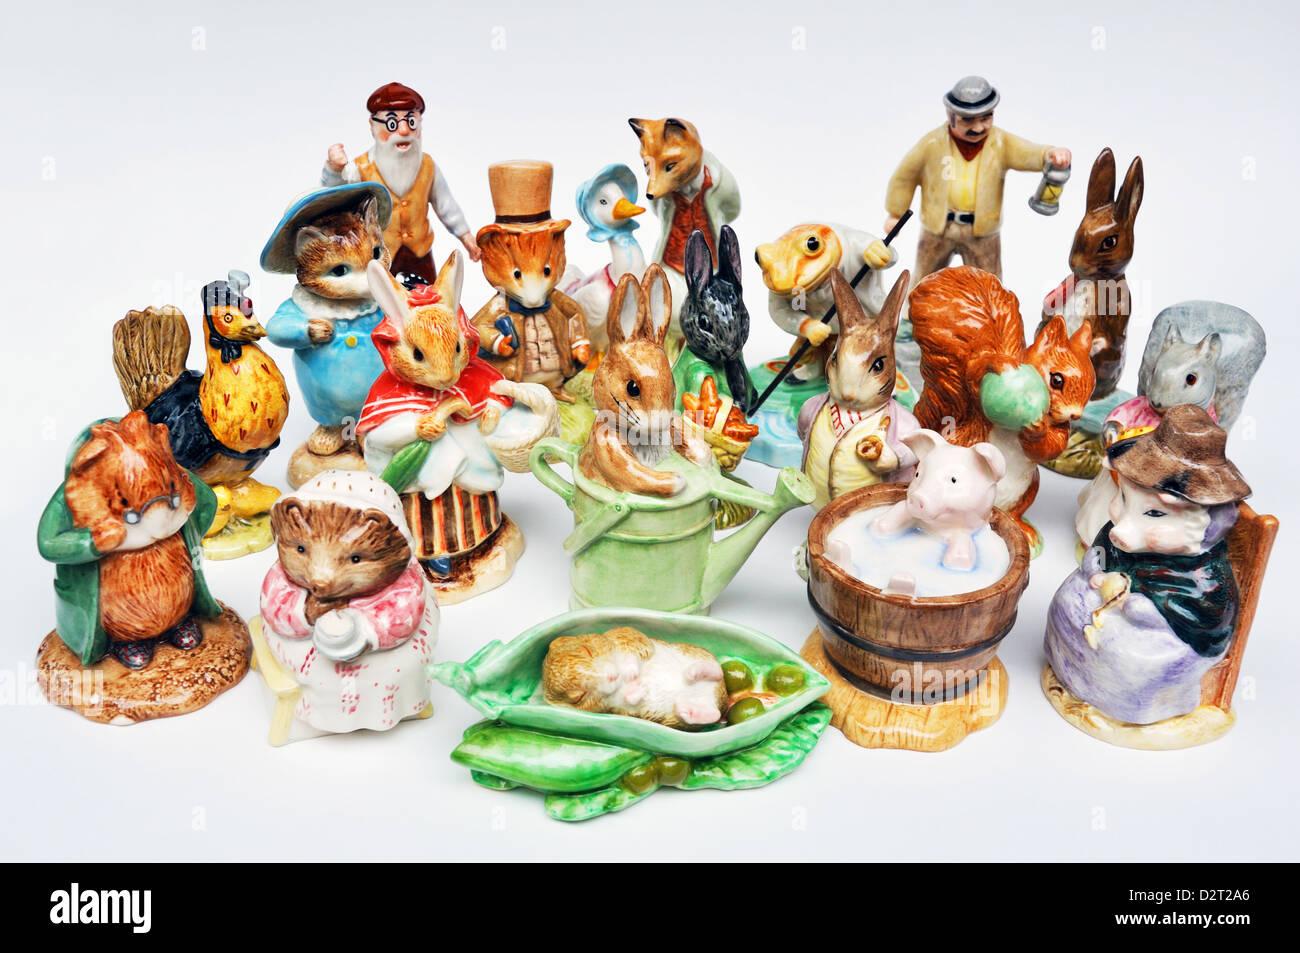 Beatrix Potter Peter Rabbit Royal Doulton figurines Stock Photo